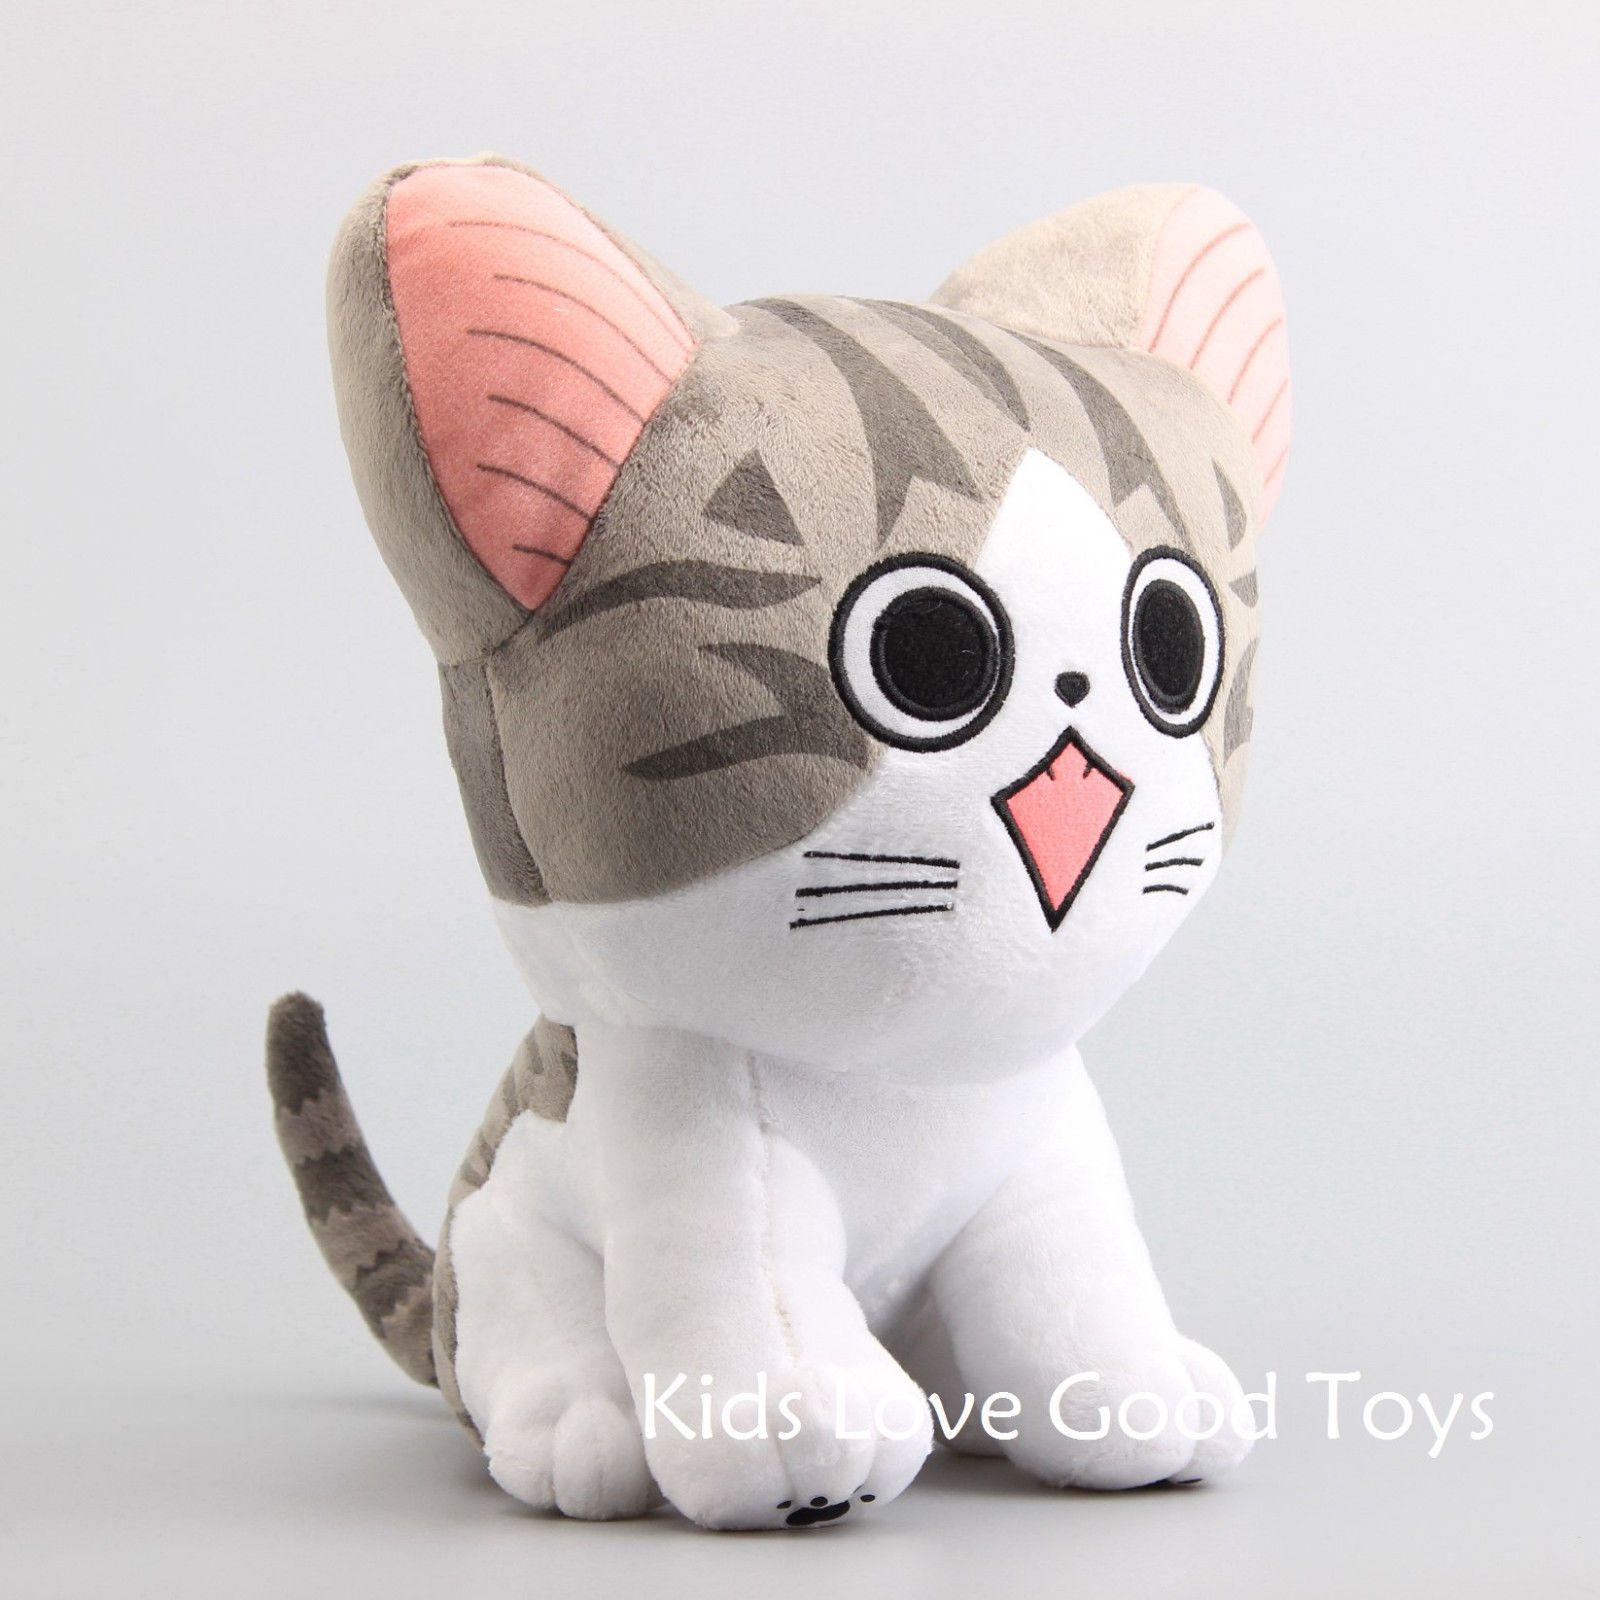 Predownload: 12 2 12 Anime Chi S Sweet Home Plush Toy Stuffed Animal Doll Figure Teddy Xmas Gift Ebay Collectibles Pet Toys Animal Dolls Plush Toy [ 1600 x 1600 Pixel ]